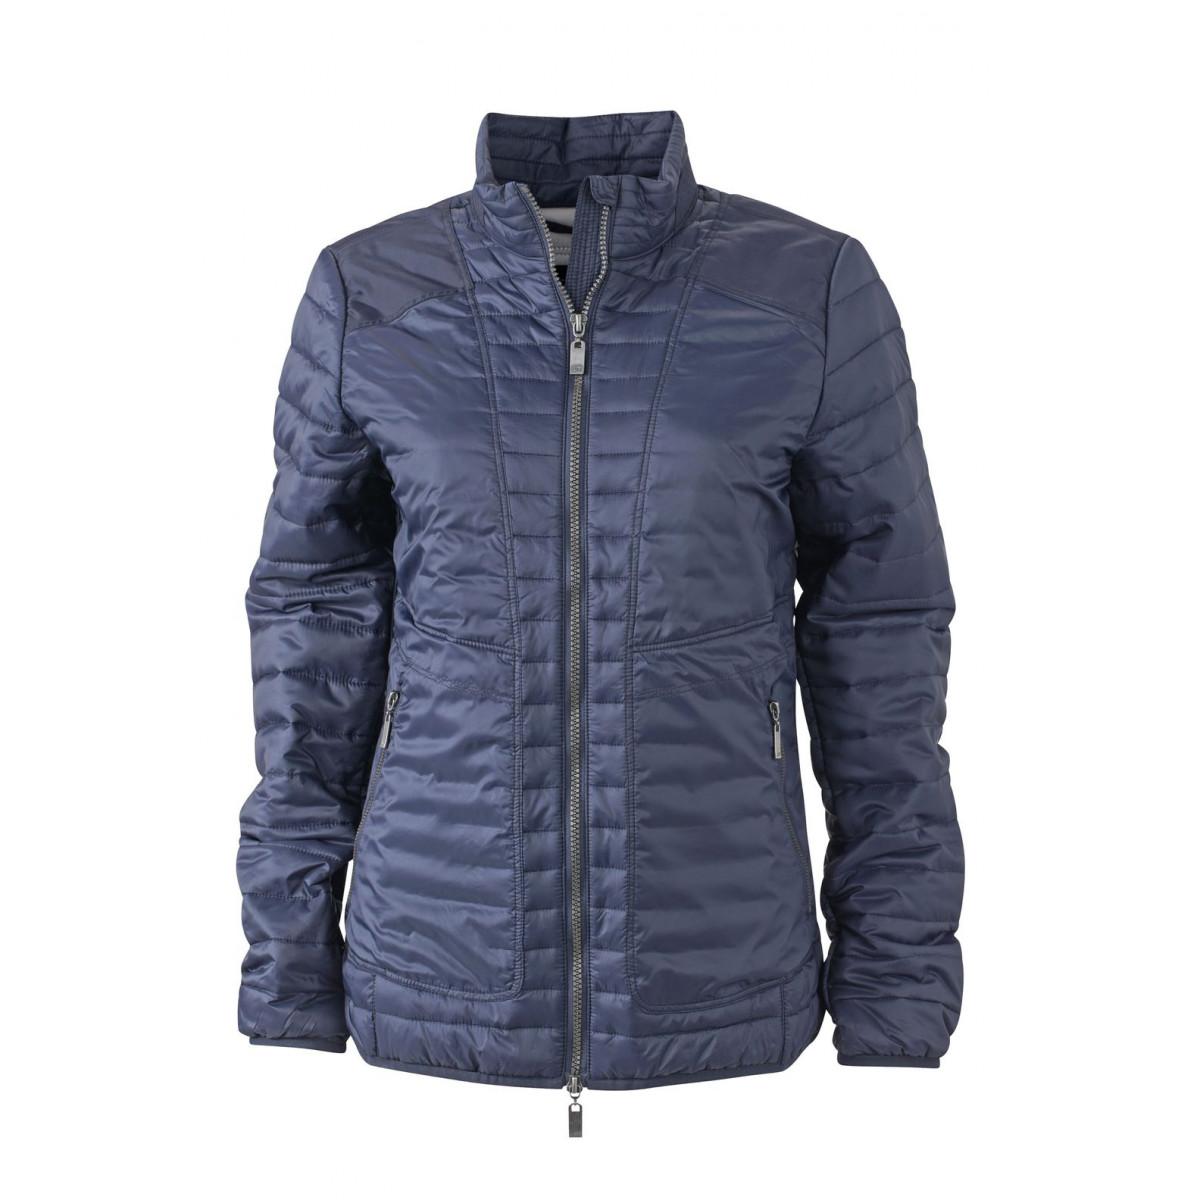 Куртка женская JN1111 Ladies Lightweight Jacket - Темно-синий/Серебряный